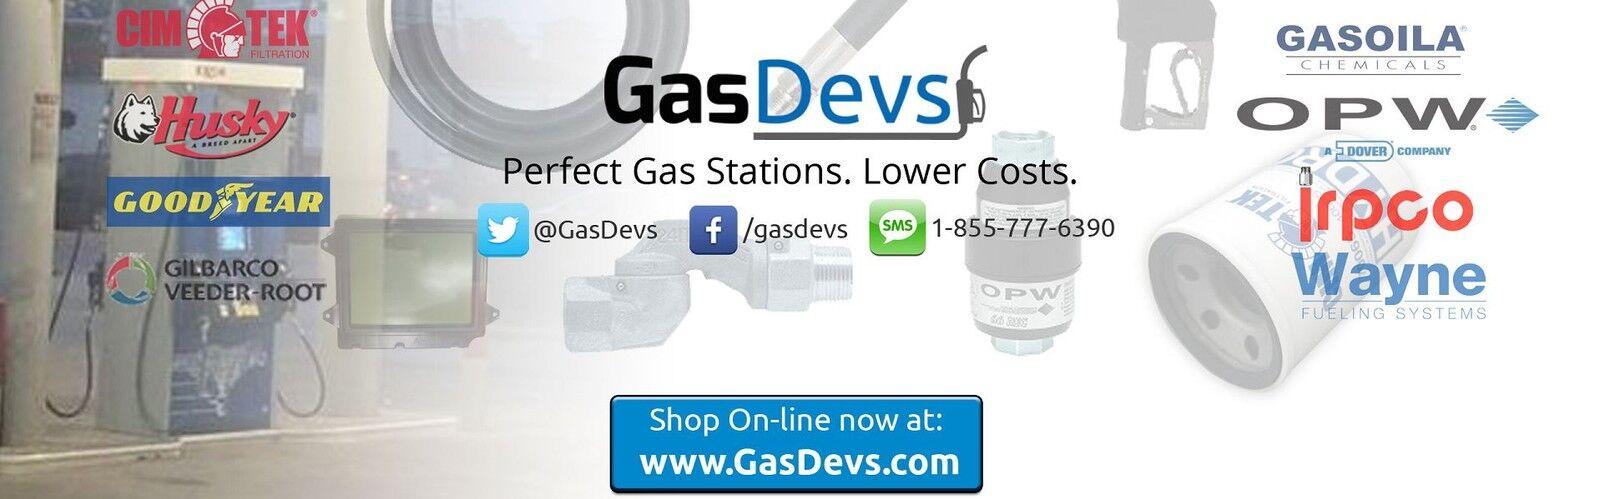 GasDevs